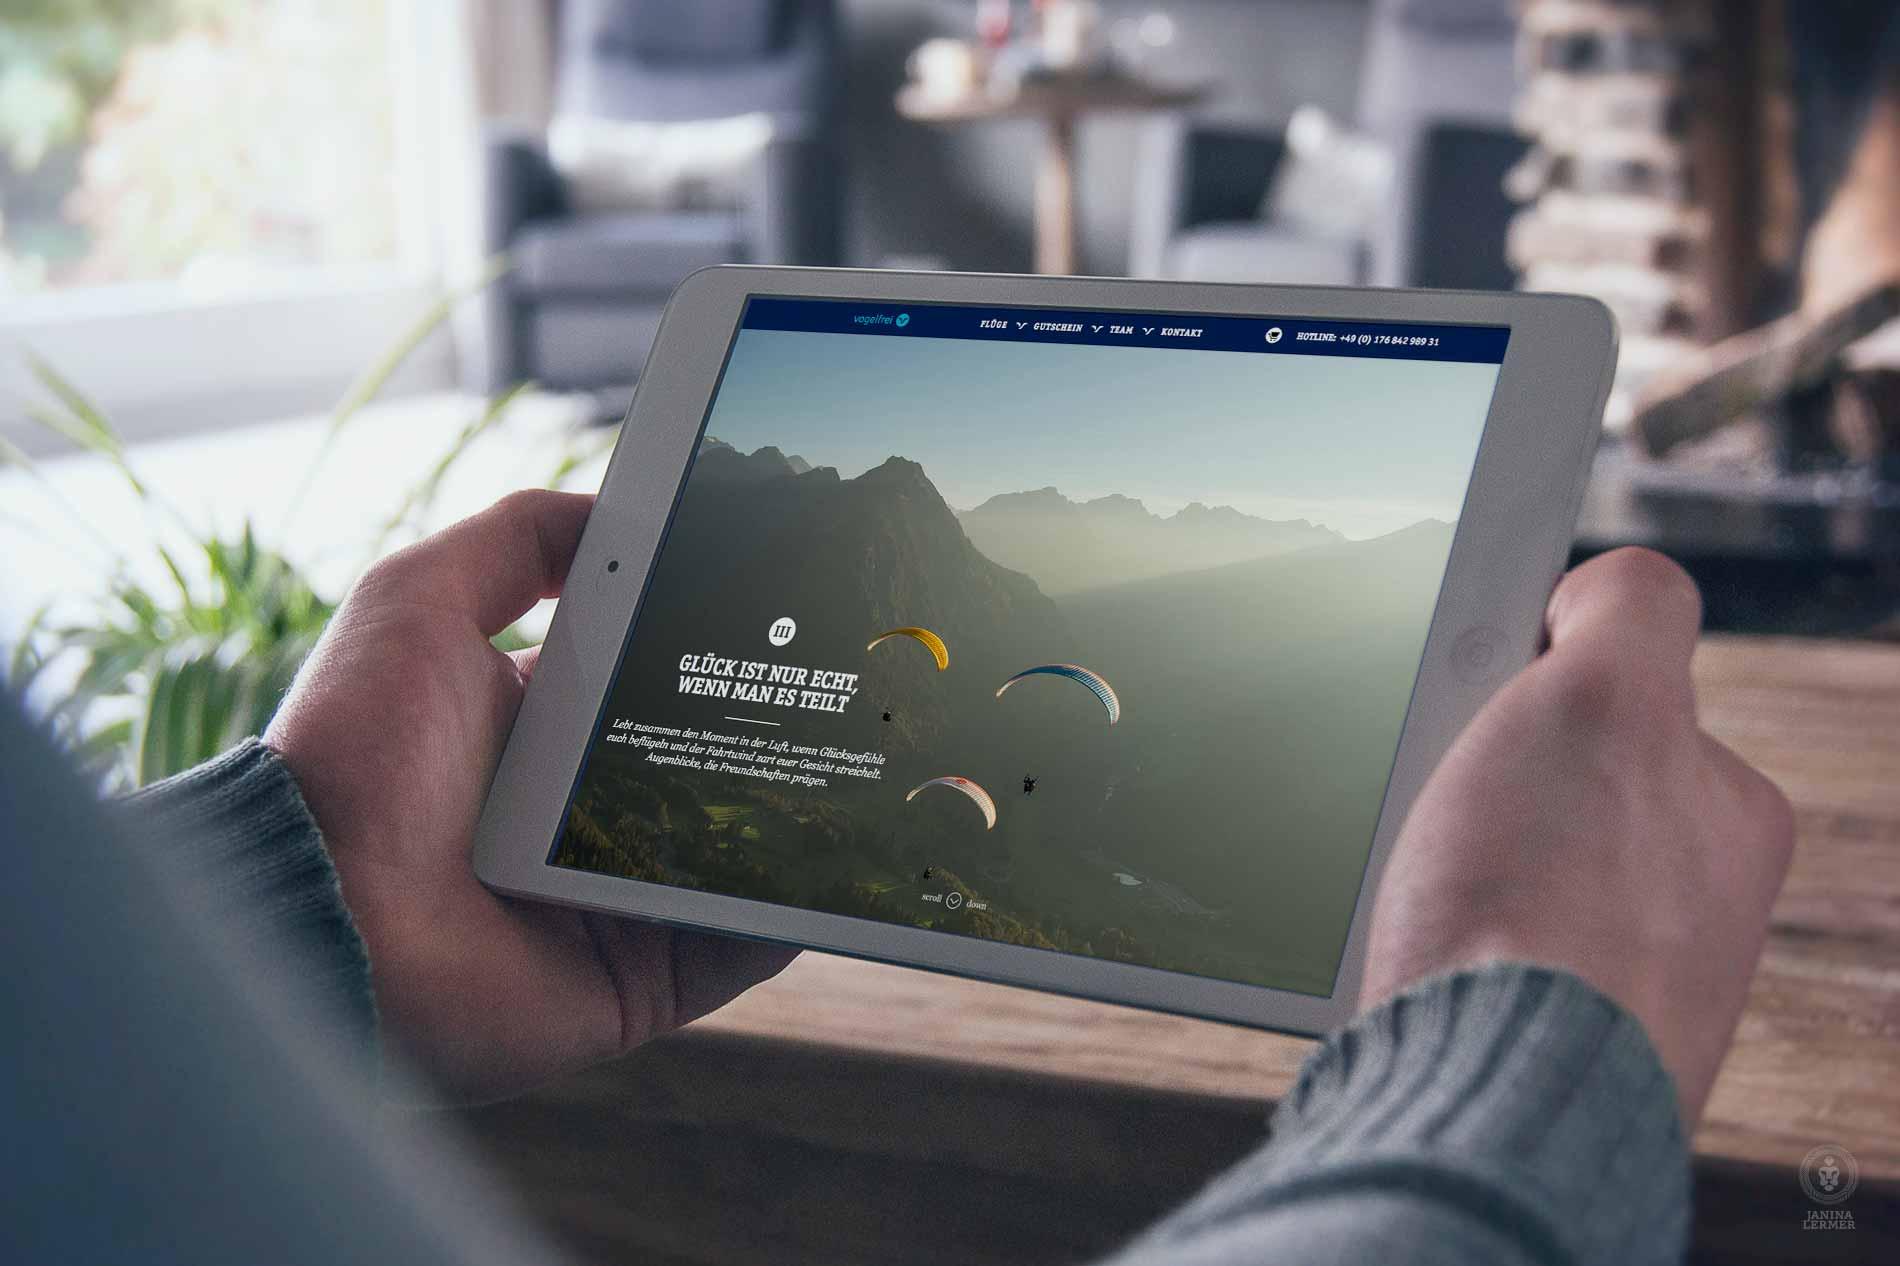 Janina-Lermer-Webseitenkonzept-Webseitengestaltung-Webdesign-Vogelfrei-Tablet_Home3